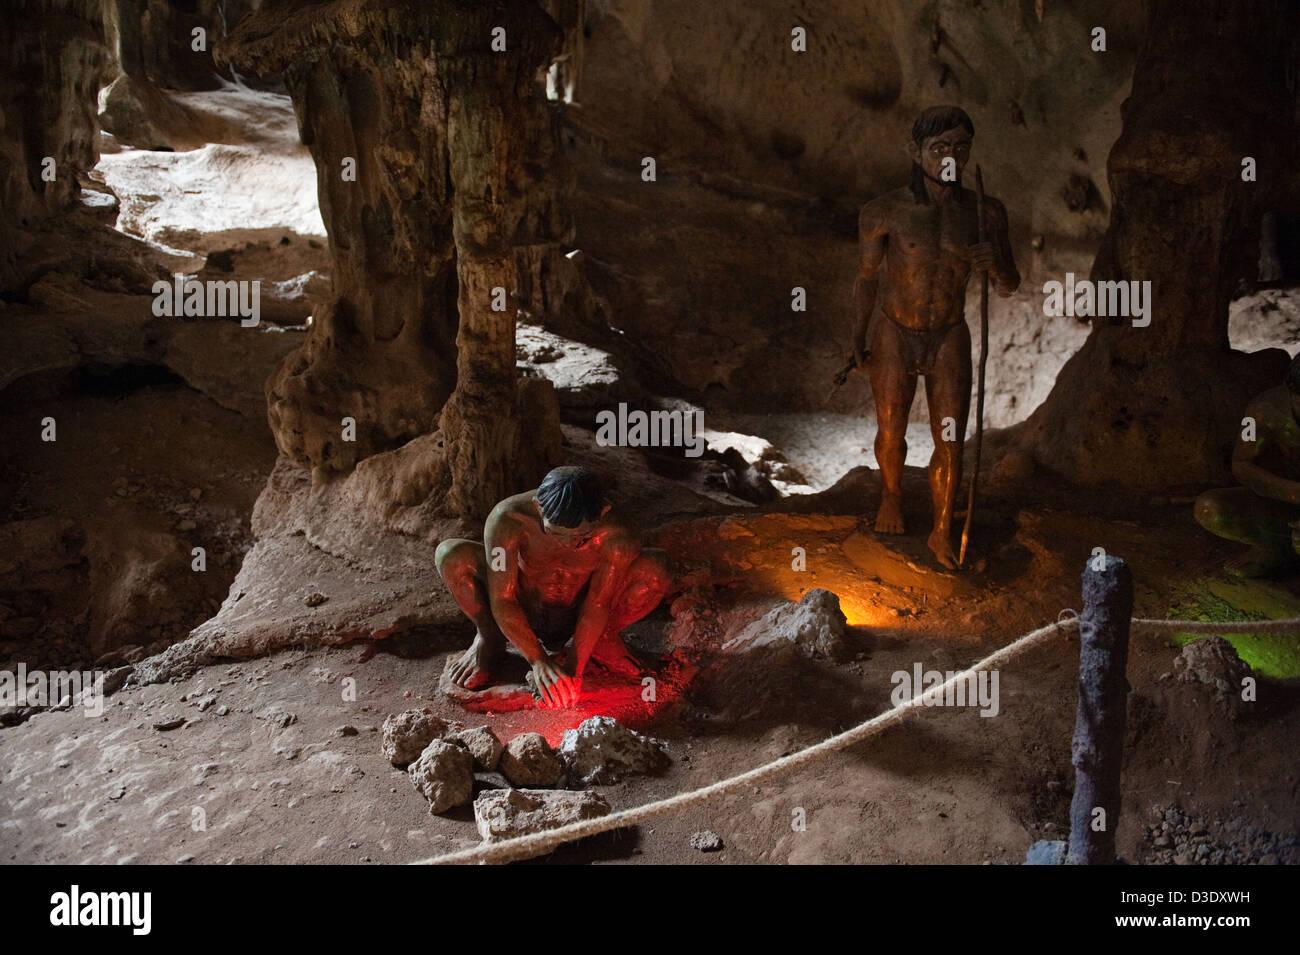 Krabi, Thailand, figures in Kanab Nam cave represent the colonization - Stock Image